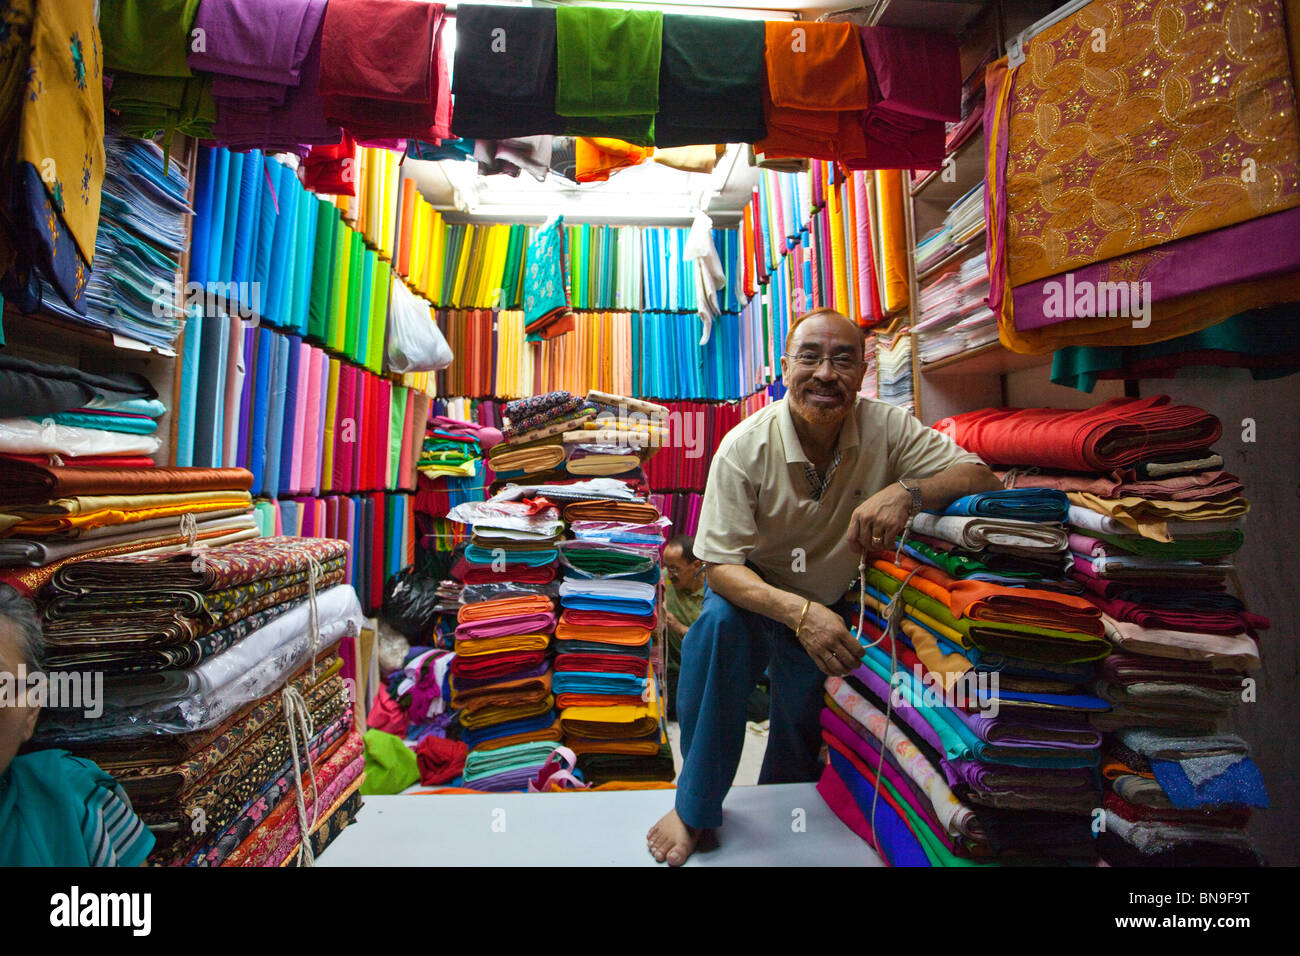 Textile vendors in Katmandu, Nepal - Stock Image